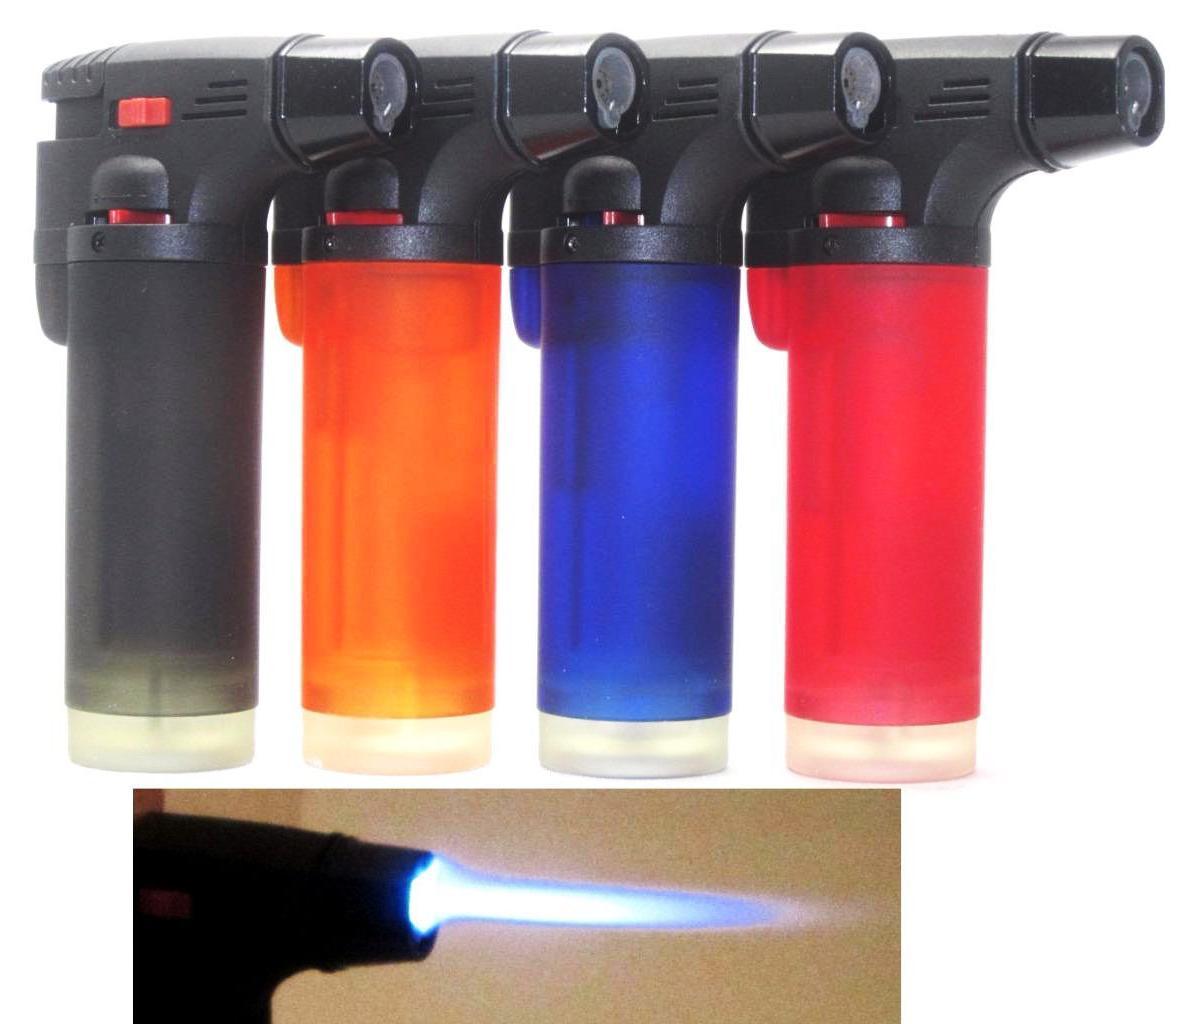 4 Butane Torch Gun Adjustable Jet Flame